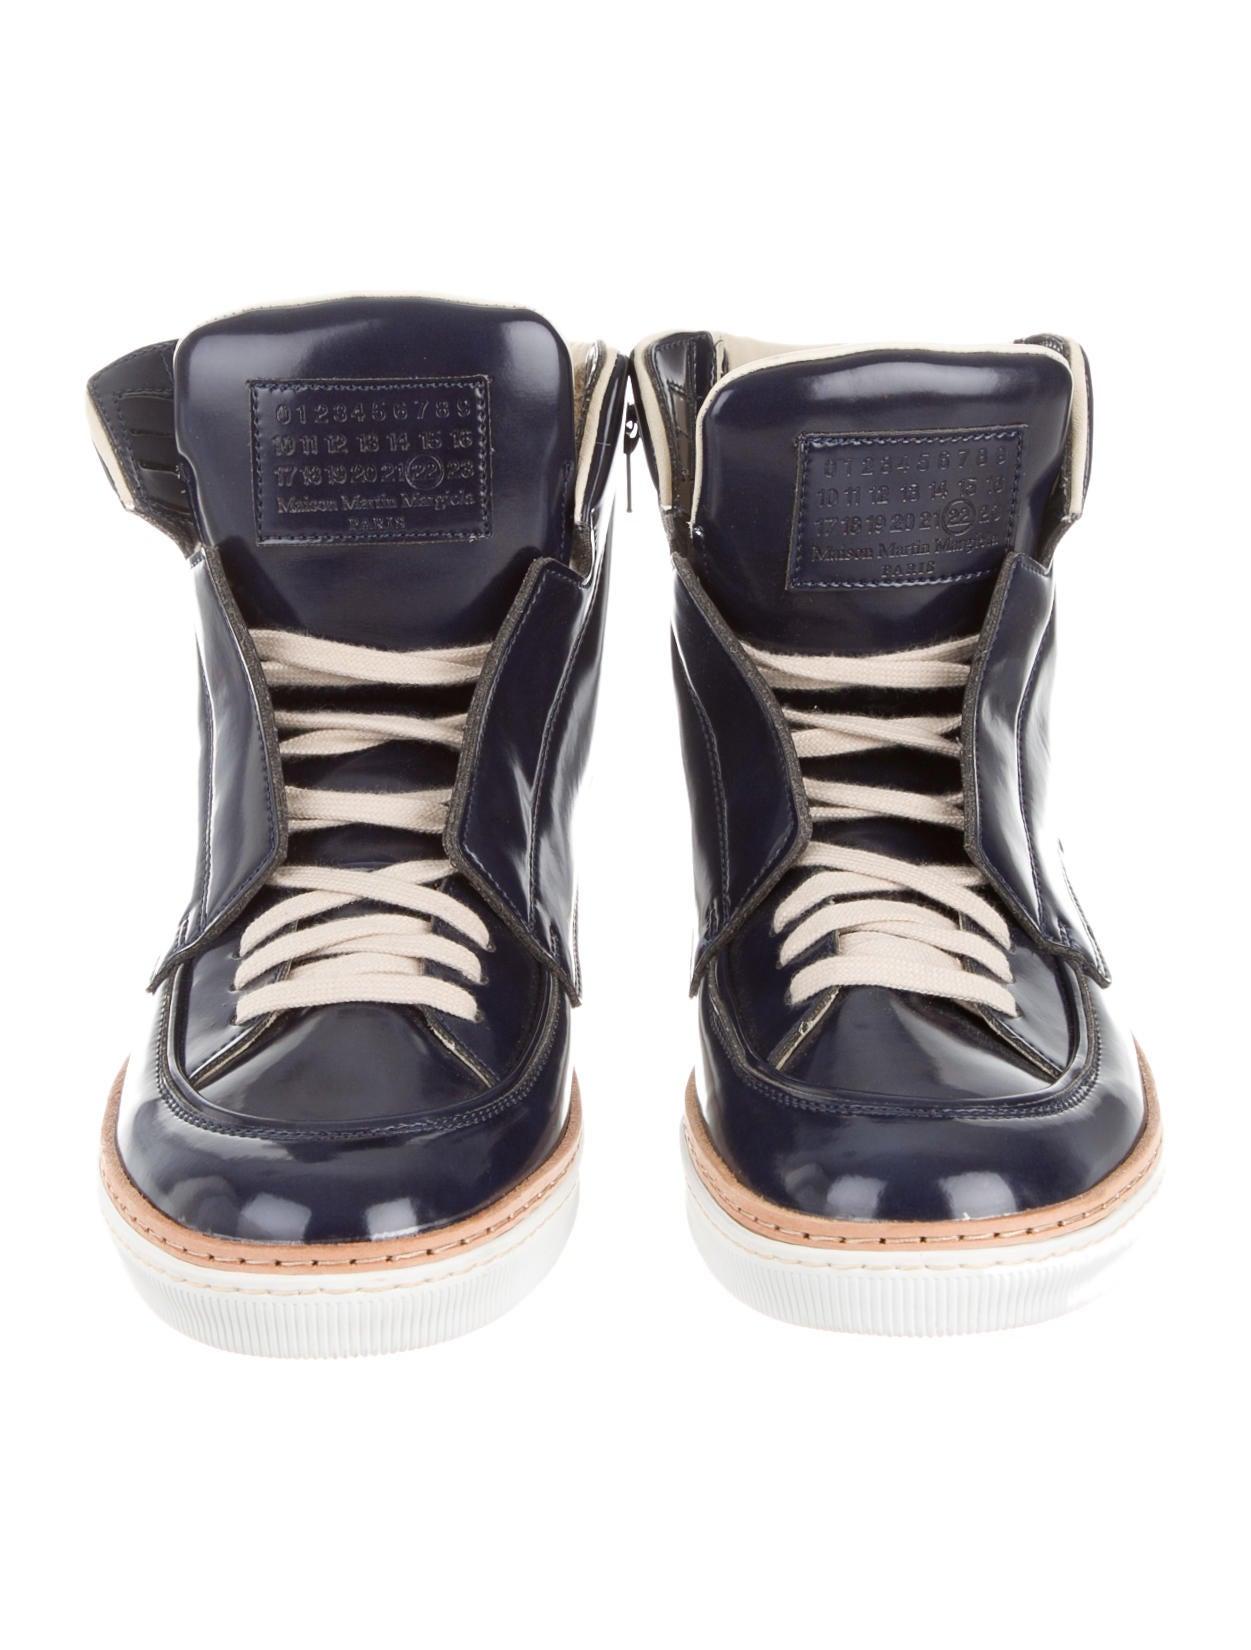 maison martin margiela sneakers shoes mai23415 the realreal. Black Bedroom Furniture Sets. Home Design Ideas